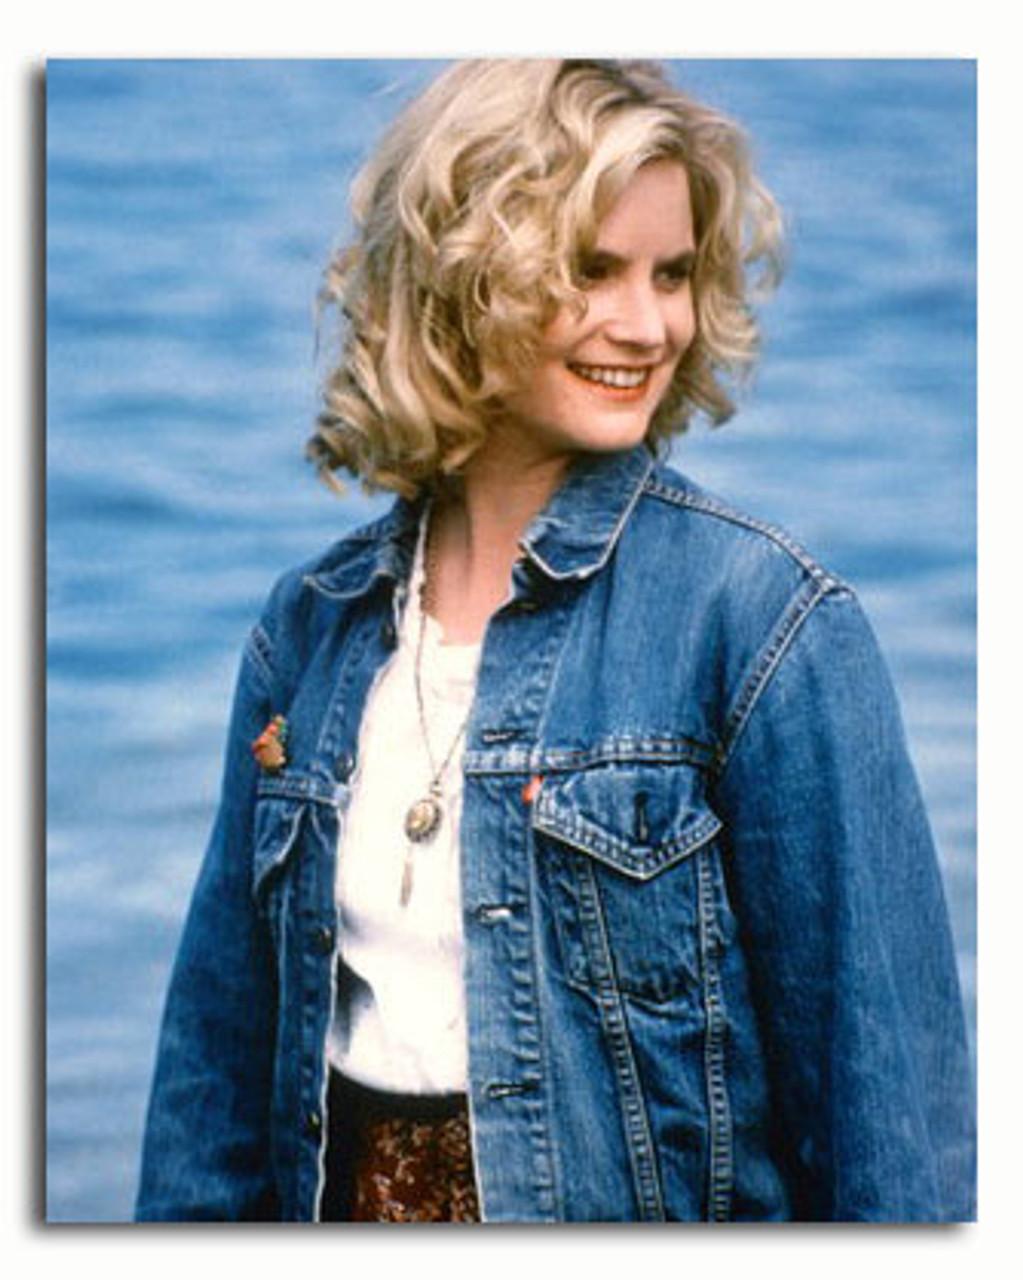 Single White Female Celebrity Movie Archive | BLueDols